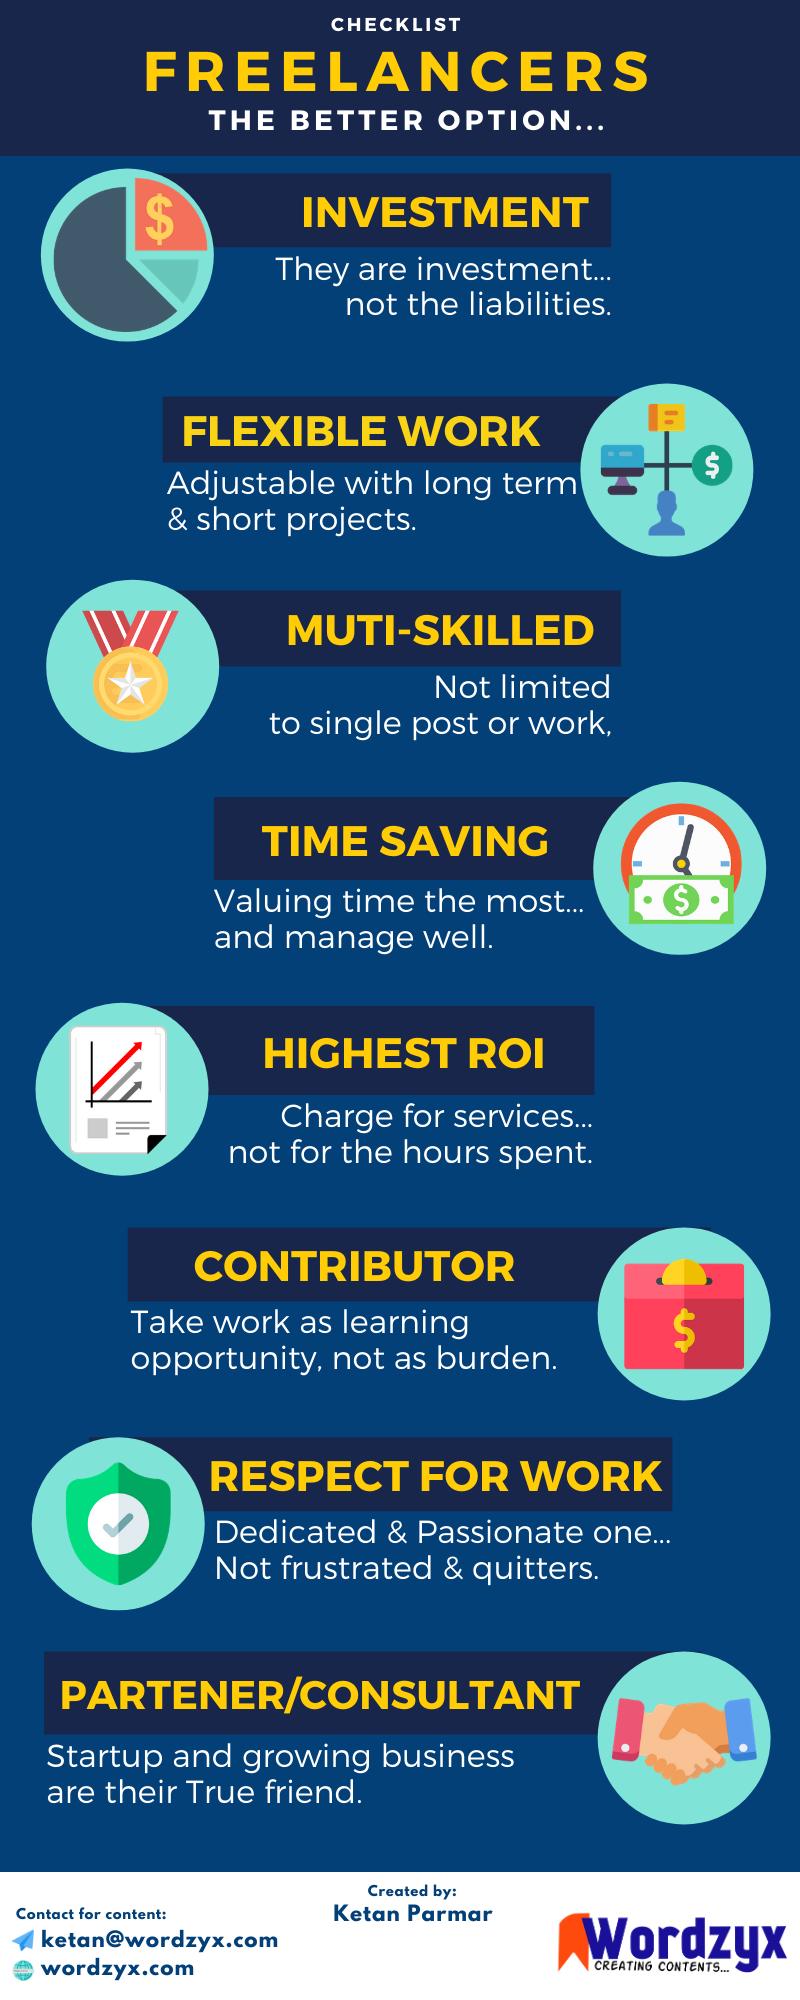 benefits of freelancers, freelancers advantages